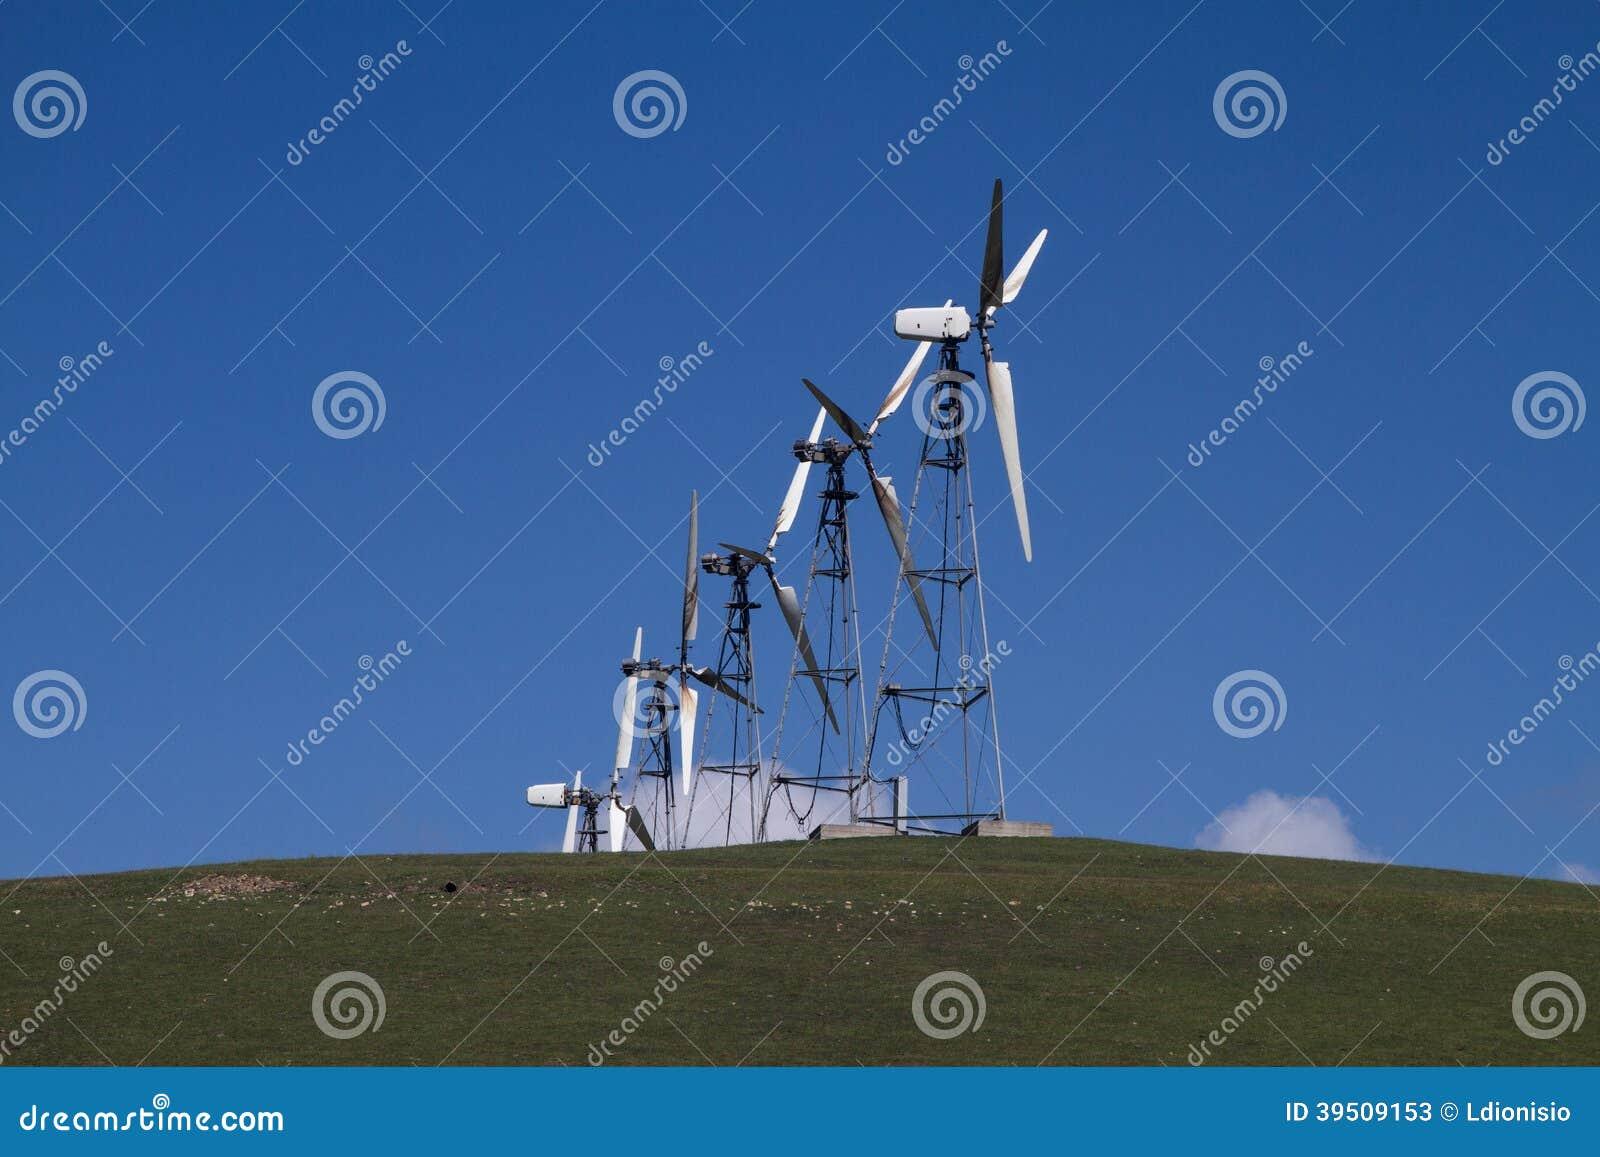 Wind Mill Farms in Northern California